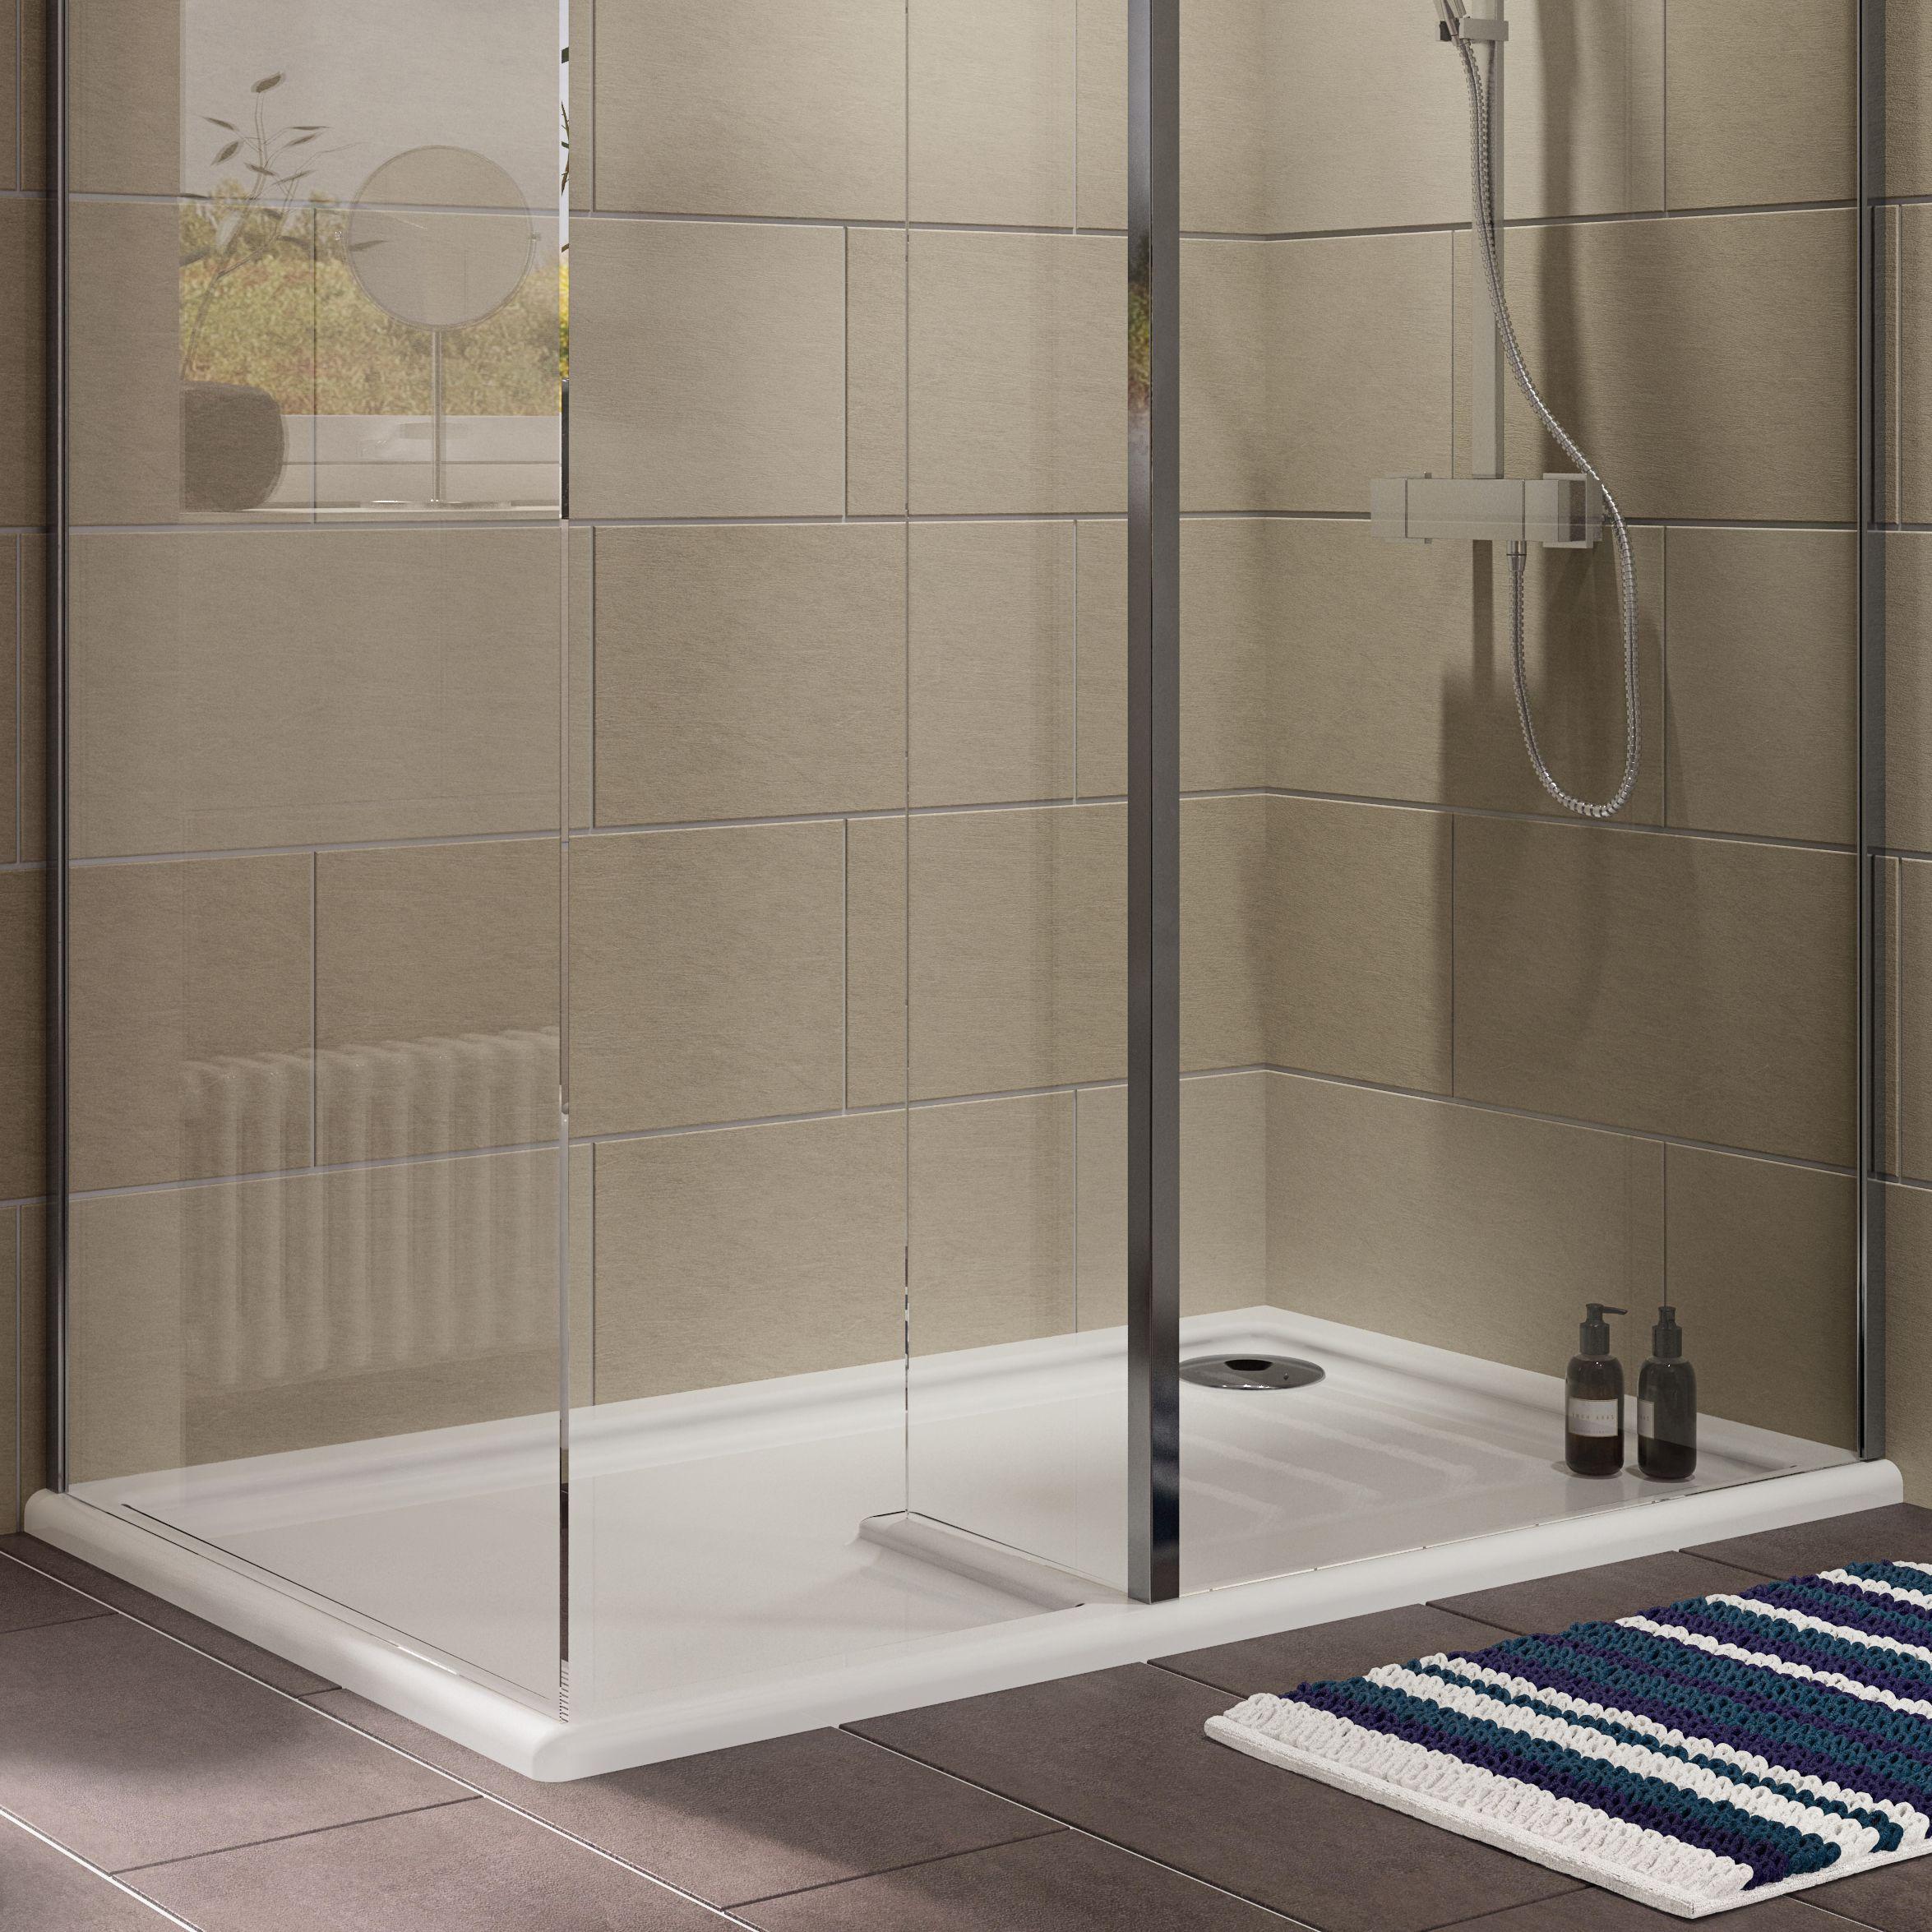 Cooke U0026 Lewis Ultra Low Profile (Lh) Rectangular Walk In Shower Tray LH  (L)1400mm (W)900mm (D)27mm | Departments | DIY At Bu0026Q